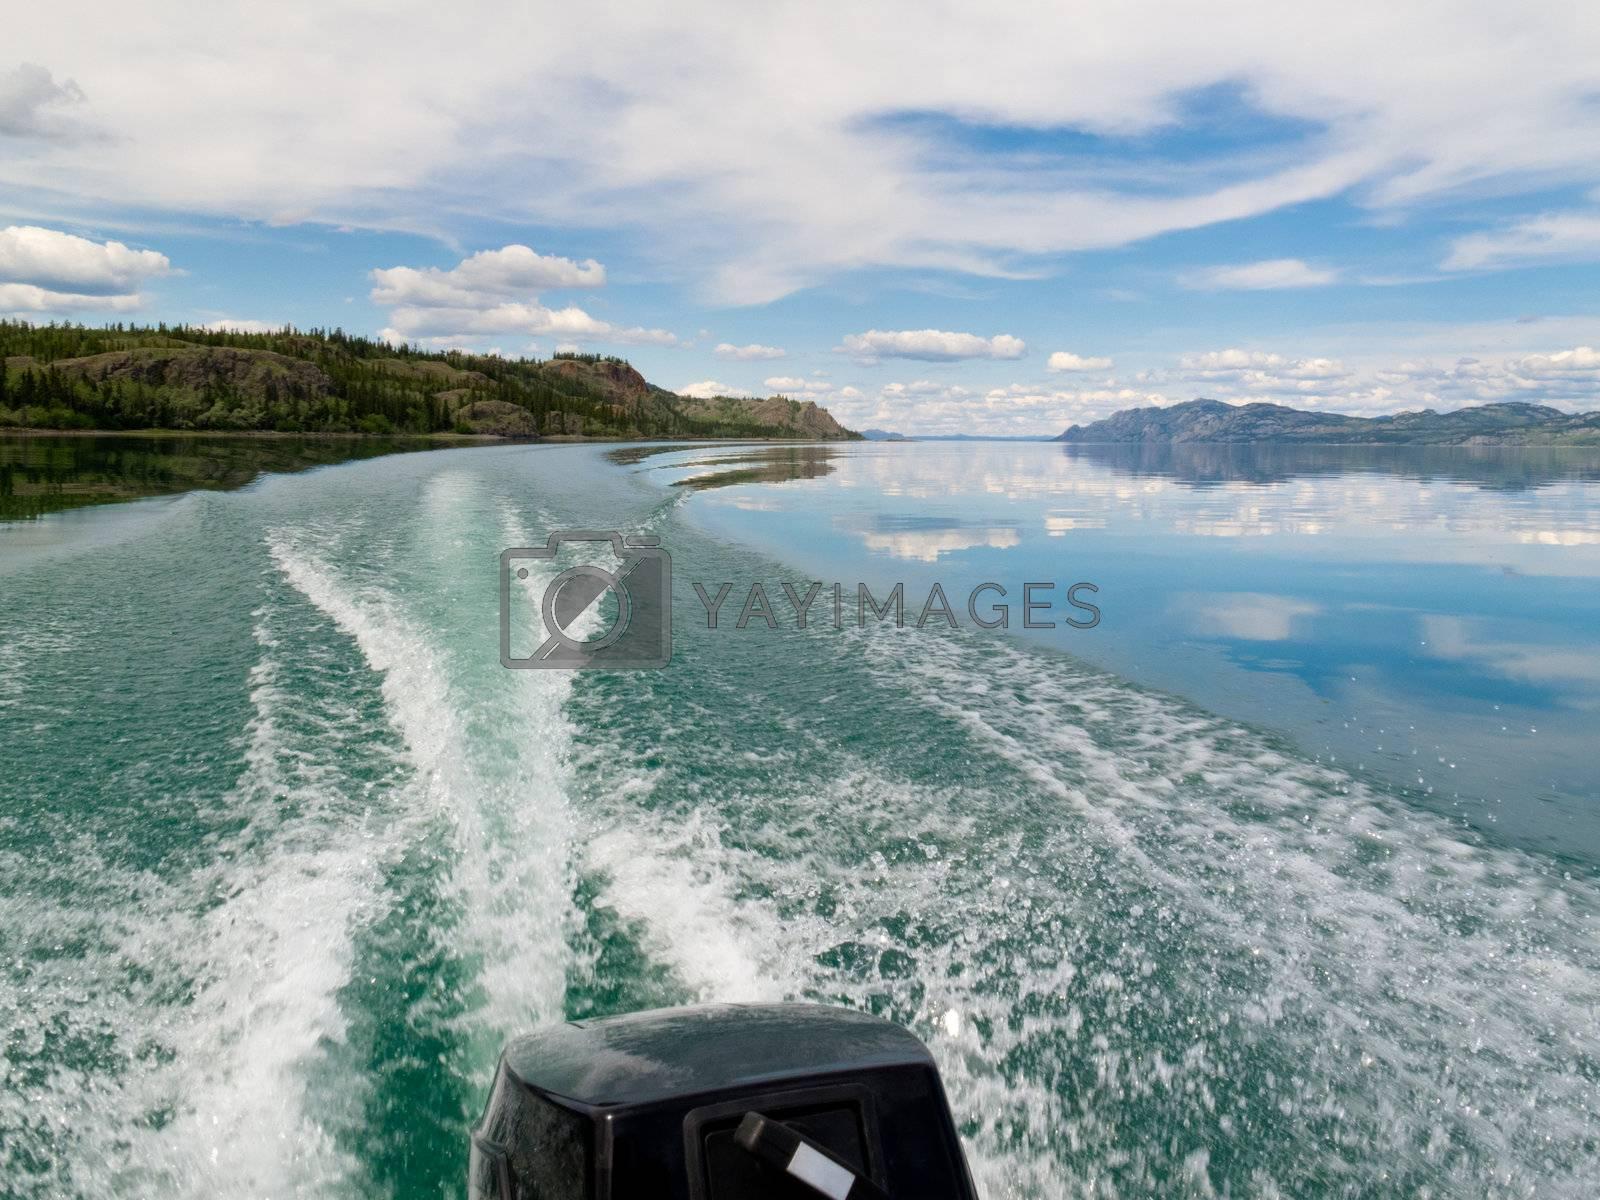 Wake of fast outboard motorboat on beautiful Lake Laberge, Yukon Territory, Canada.